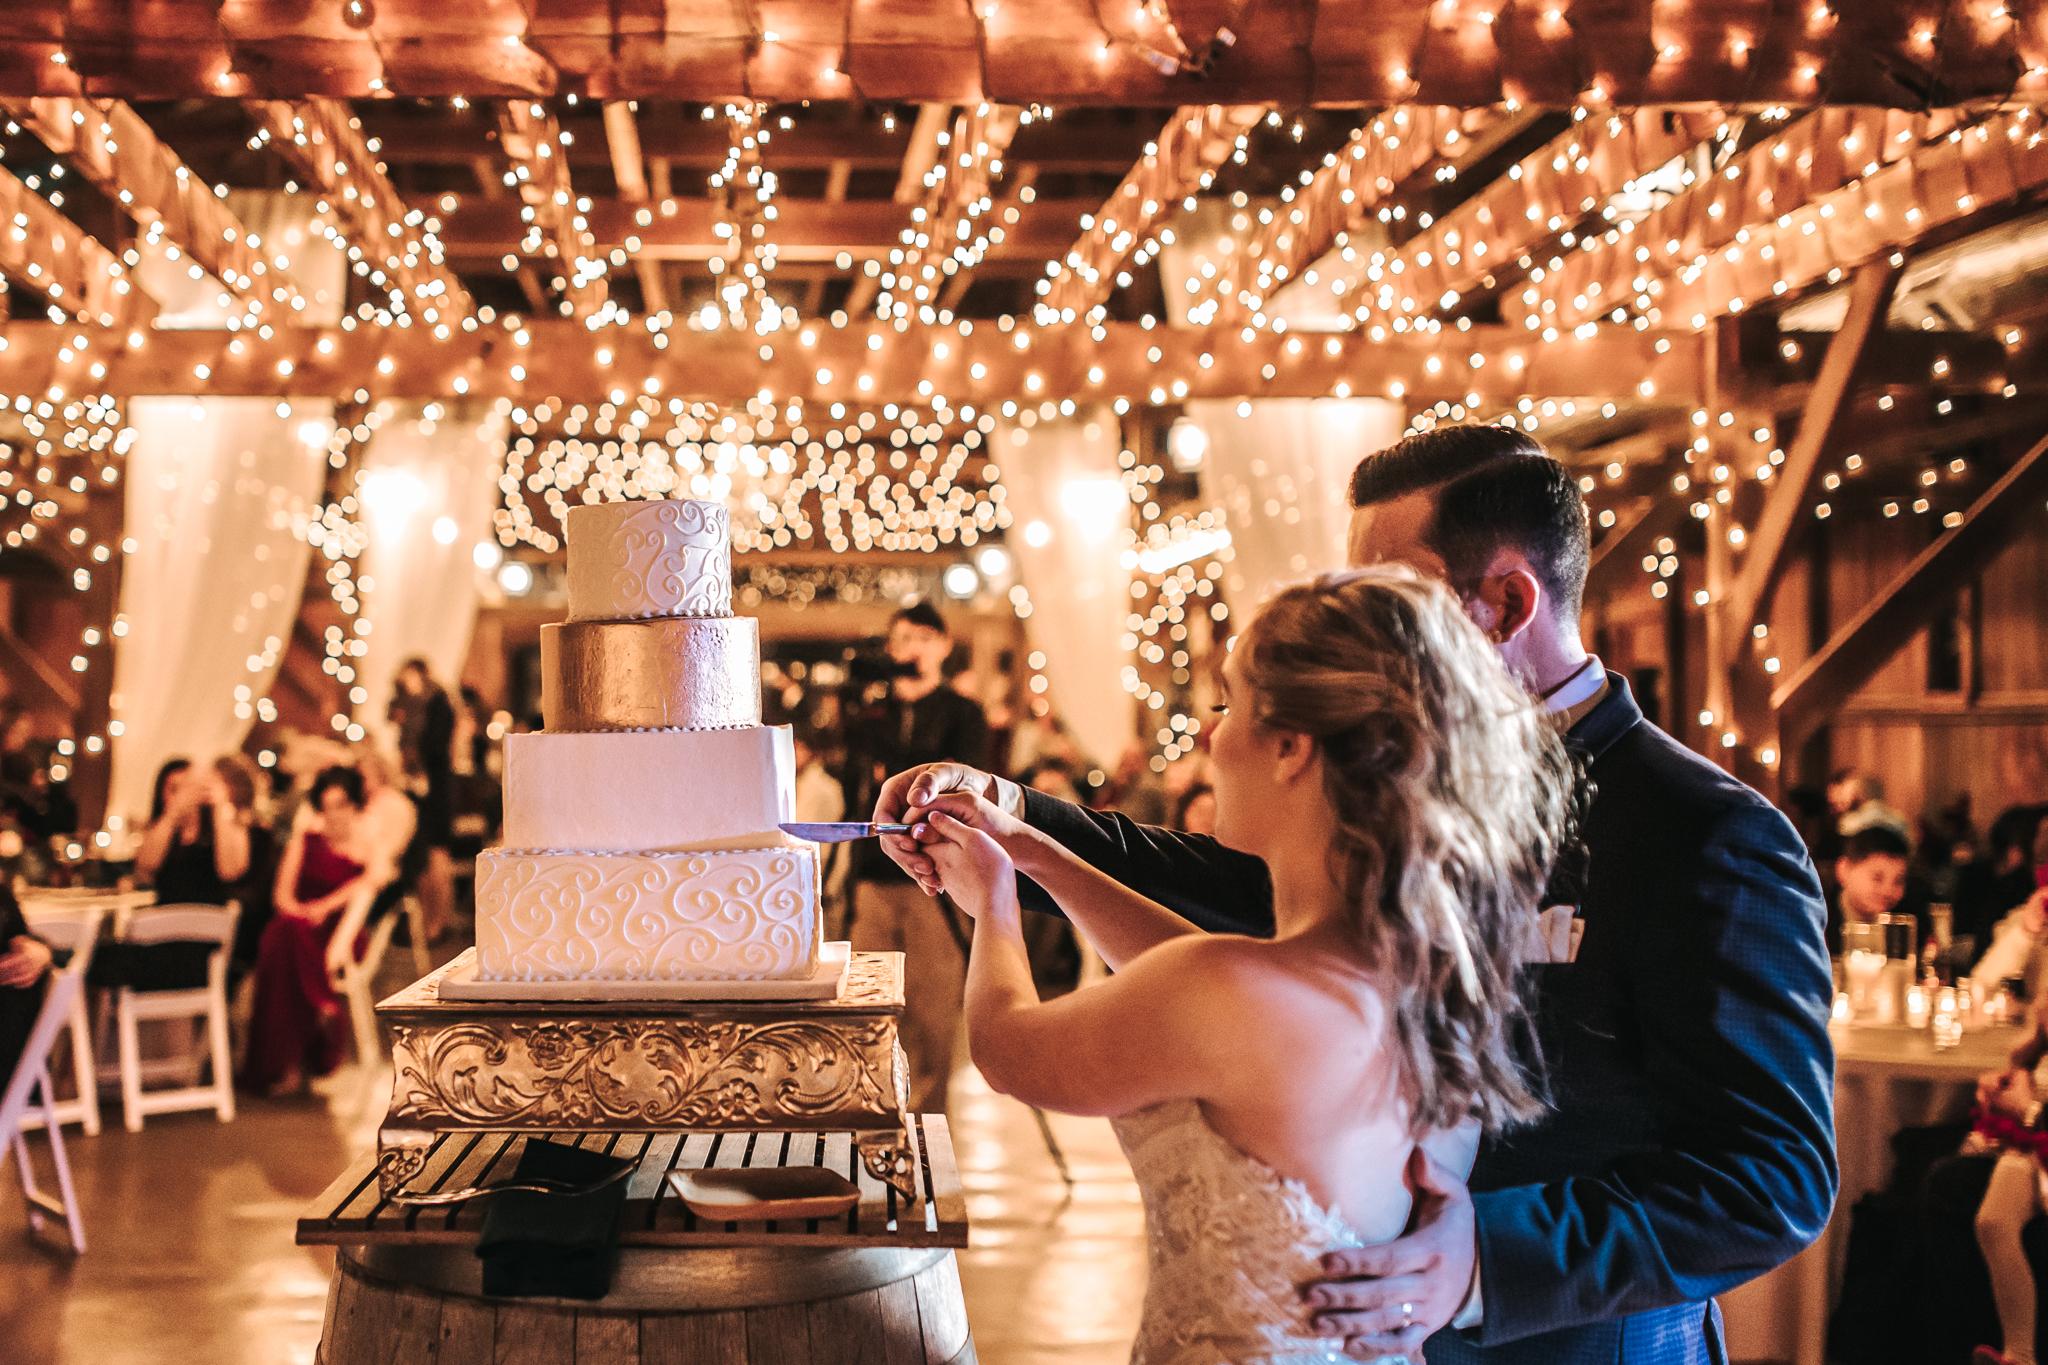 0160 Ariana Jordan Photo - Cameron & Lauren's Wedding at Talon Winery  7576.jpg